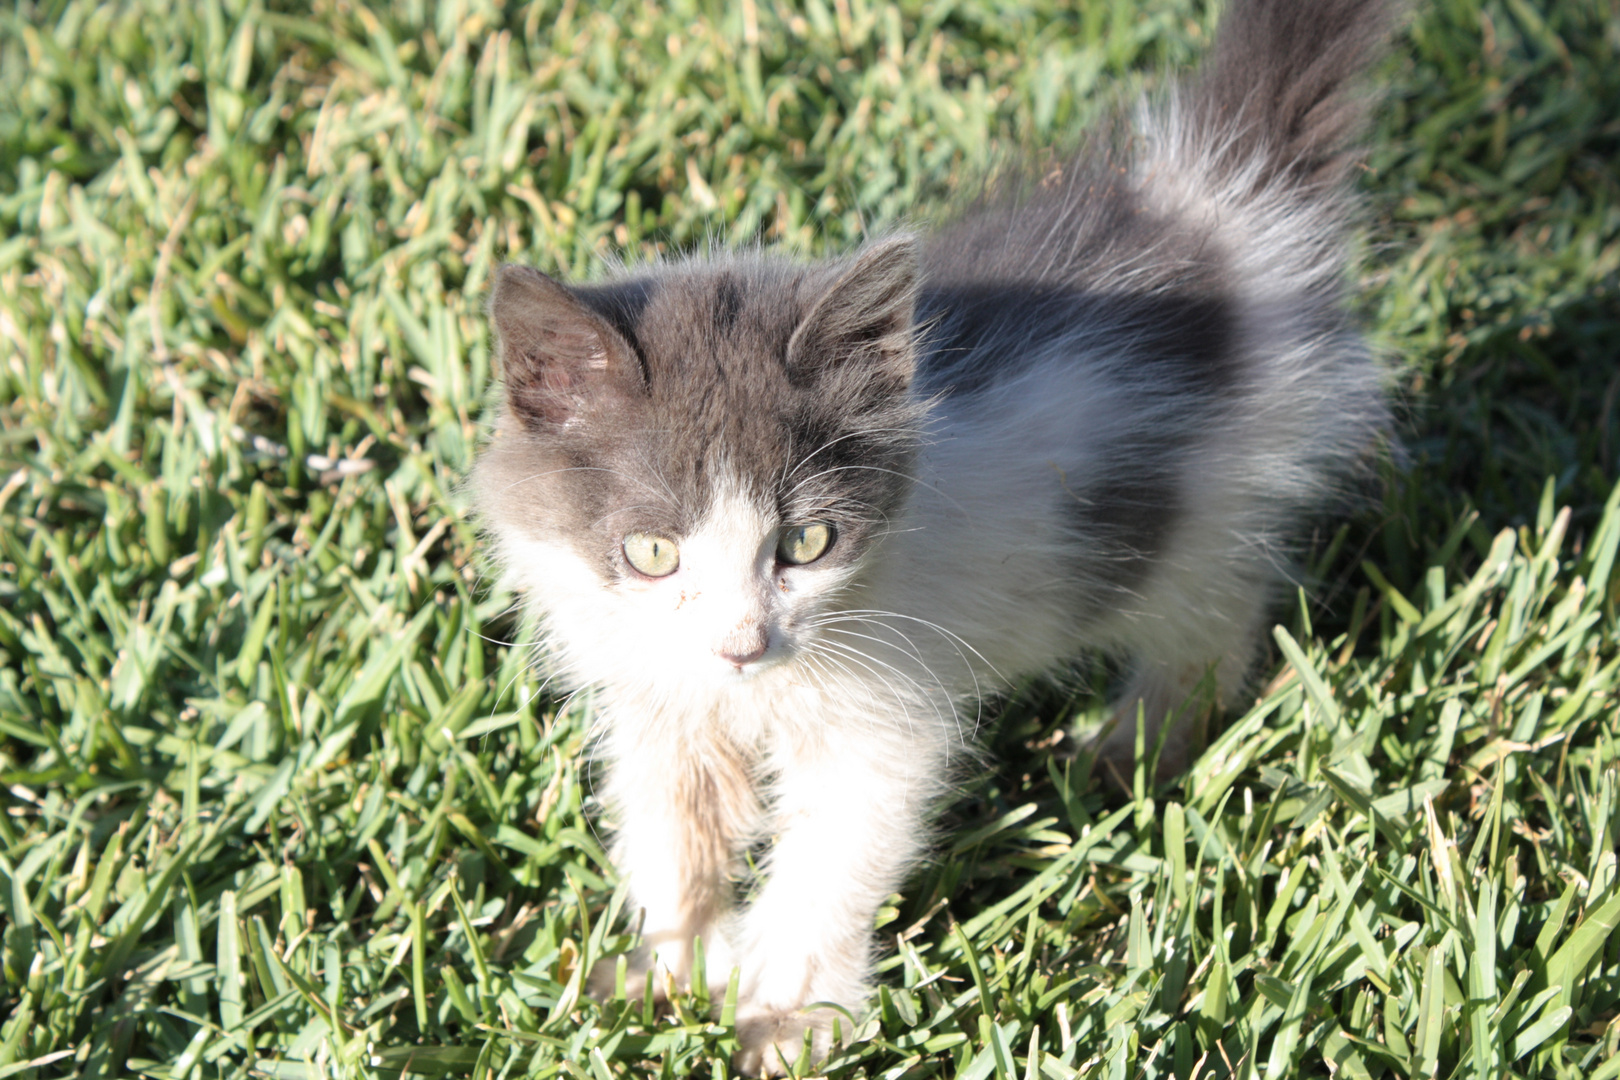 quel joli chaton!!!